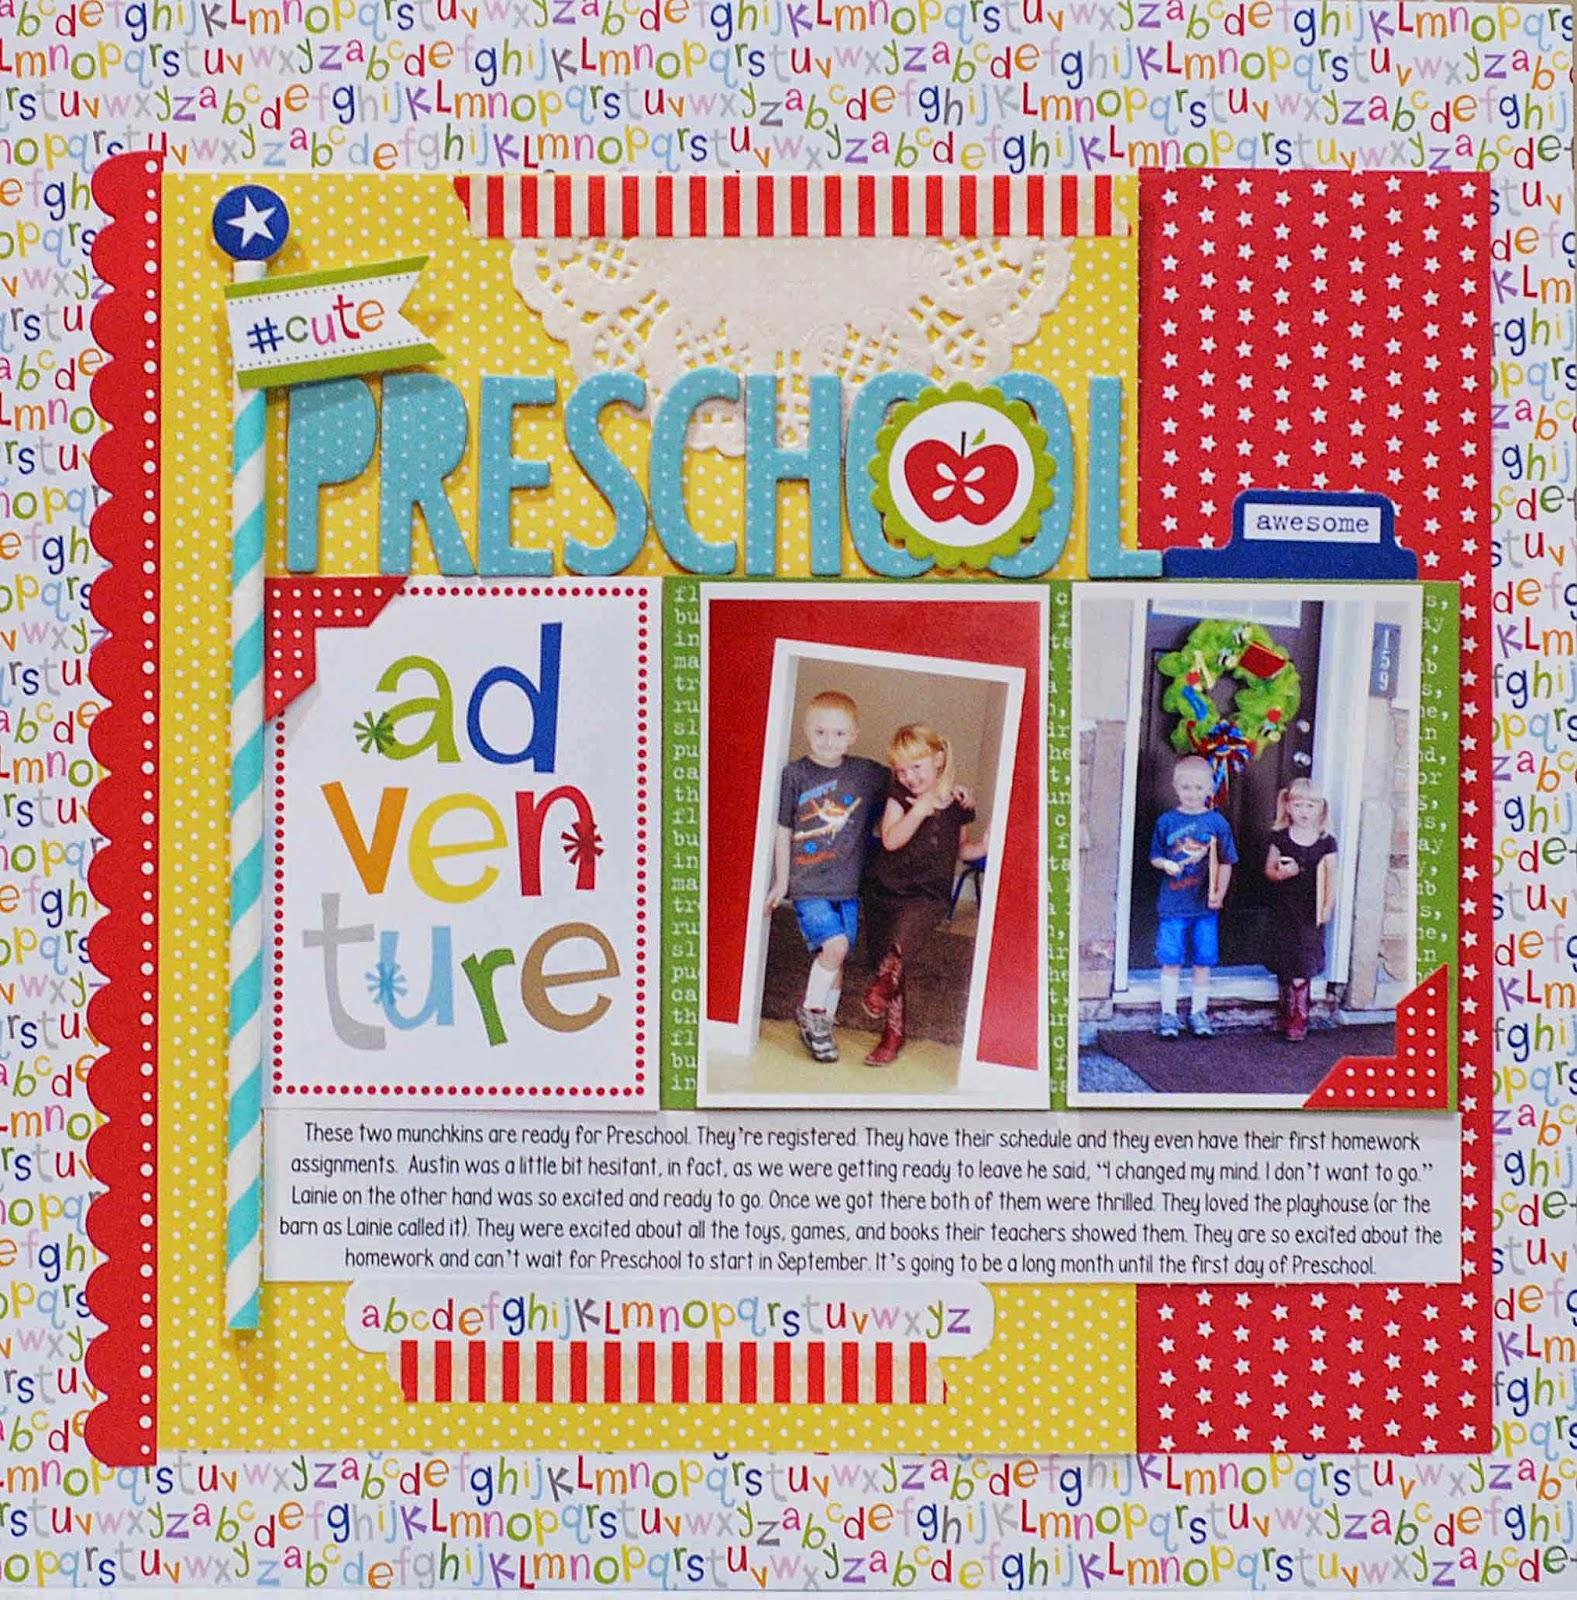 adams preschool becki preschool tutorial 818